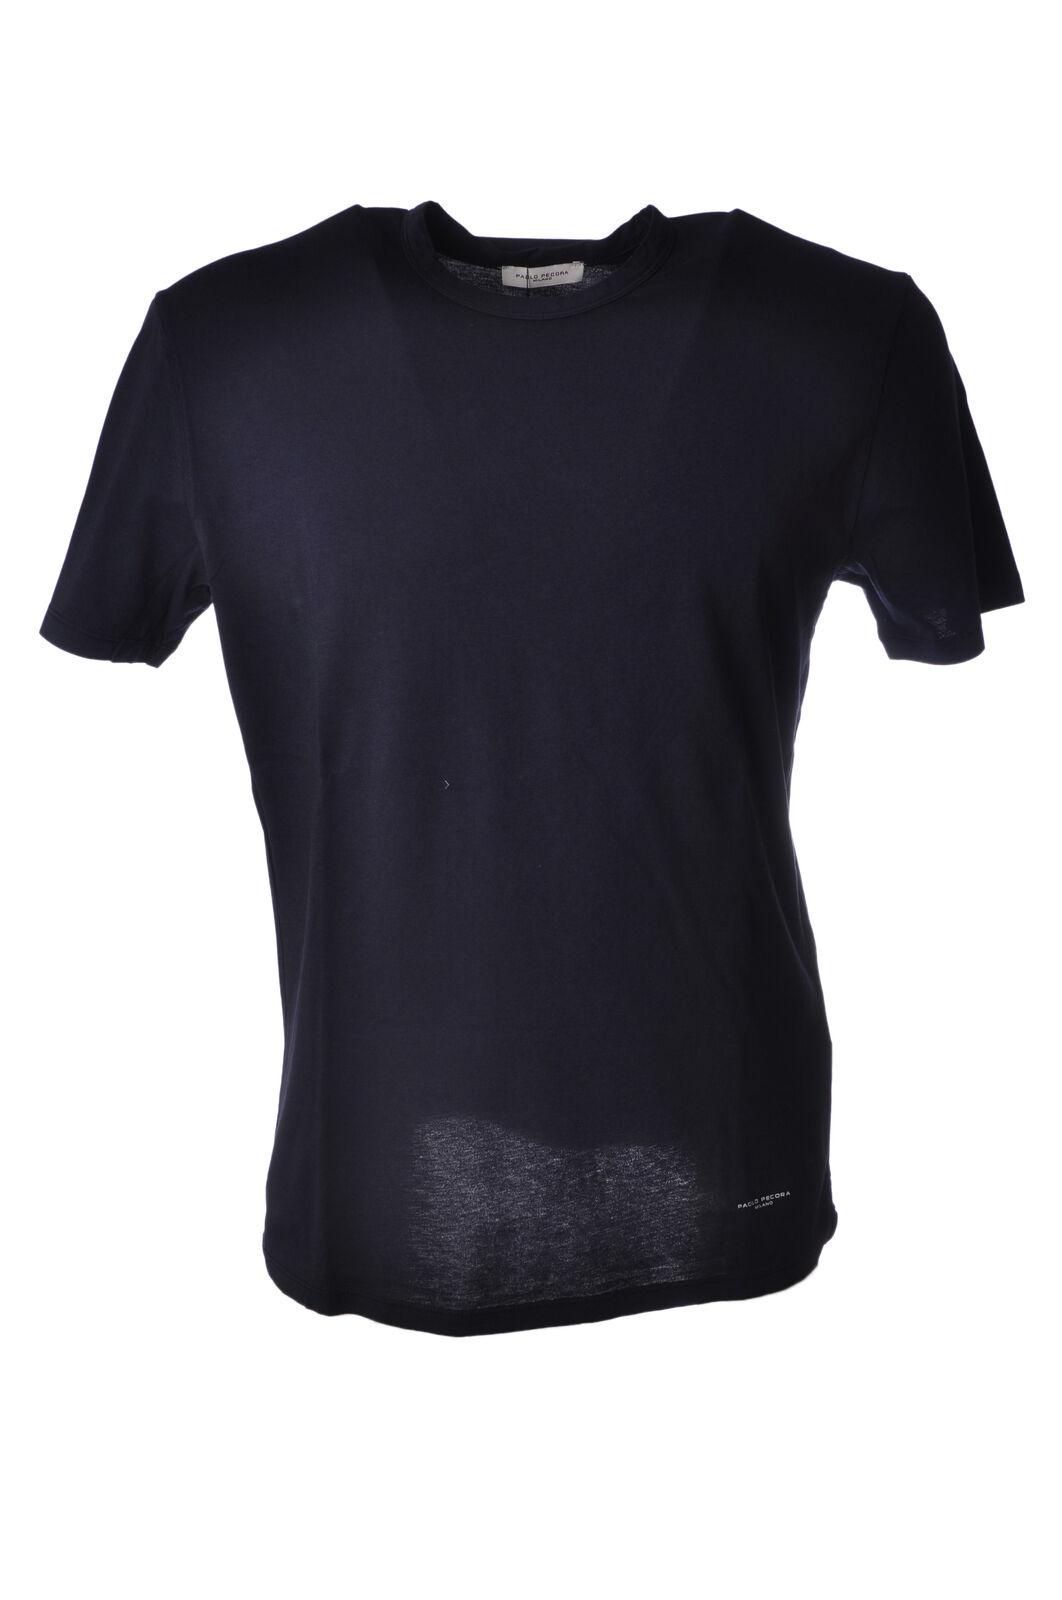 Paolo Pecora - Topwear-T-shirts - Man - Blau - 5040404E183802